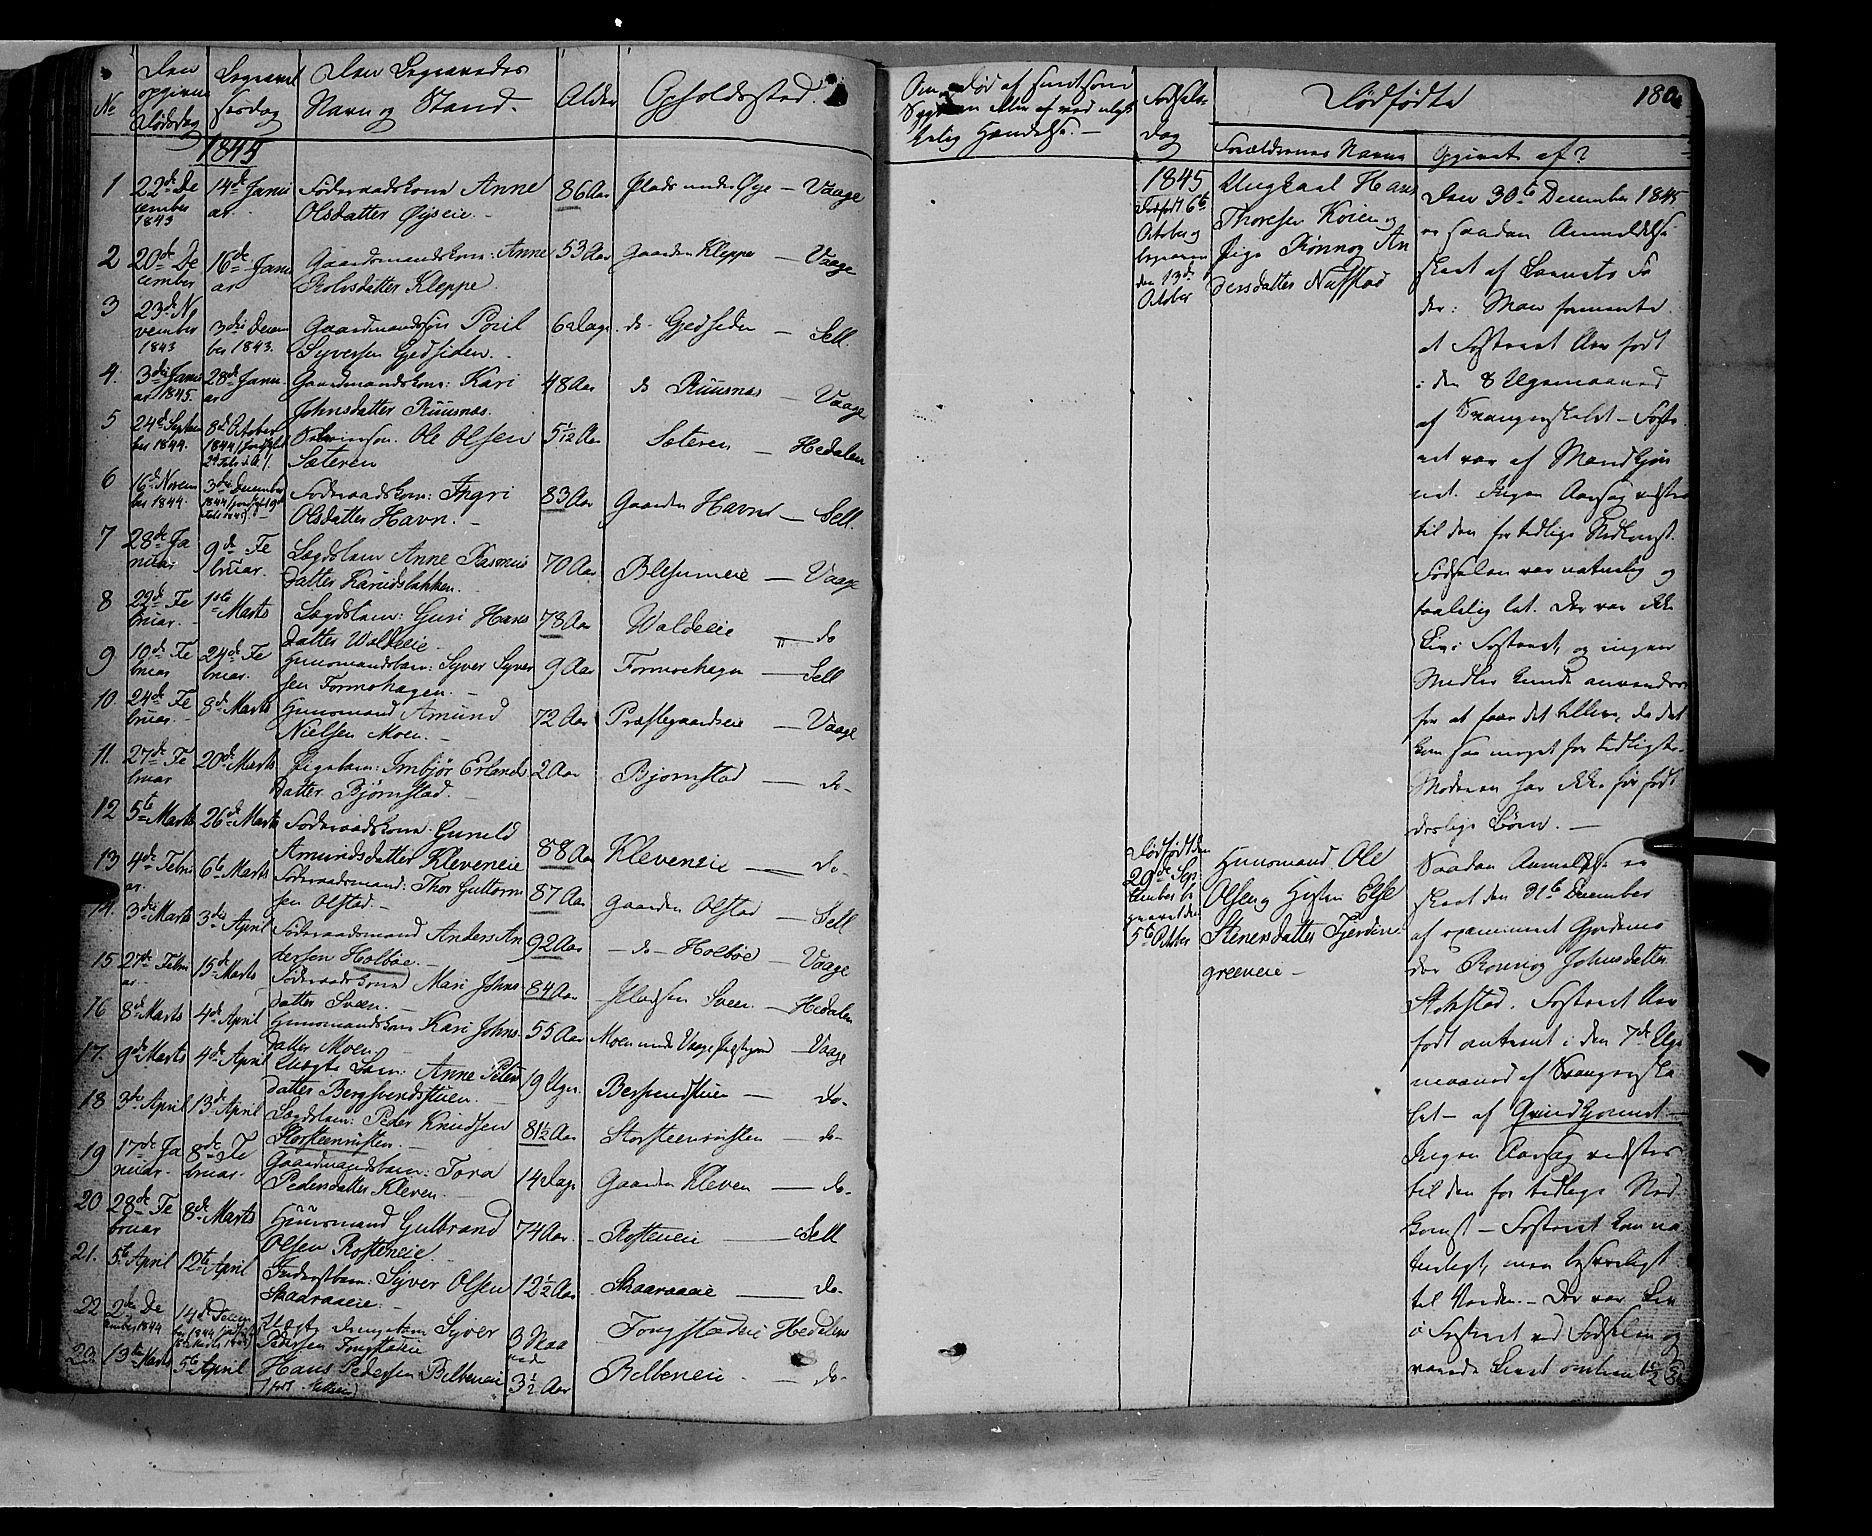 SAH, Vågå prestekontor, Ministerialbok nr. 5 /1, 1842-1856, s. 180